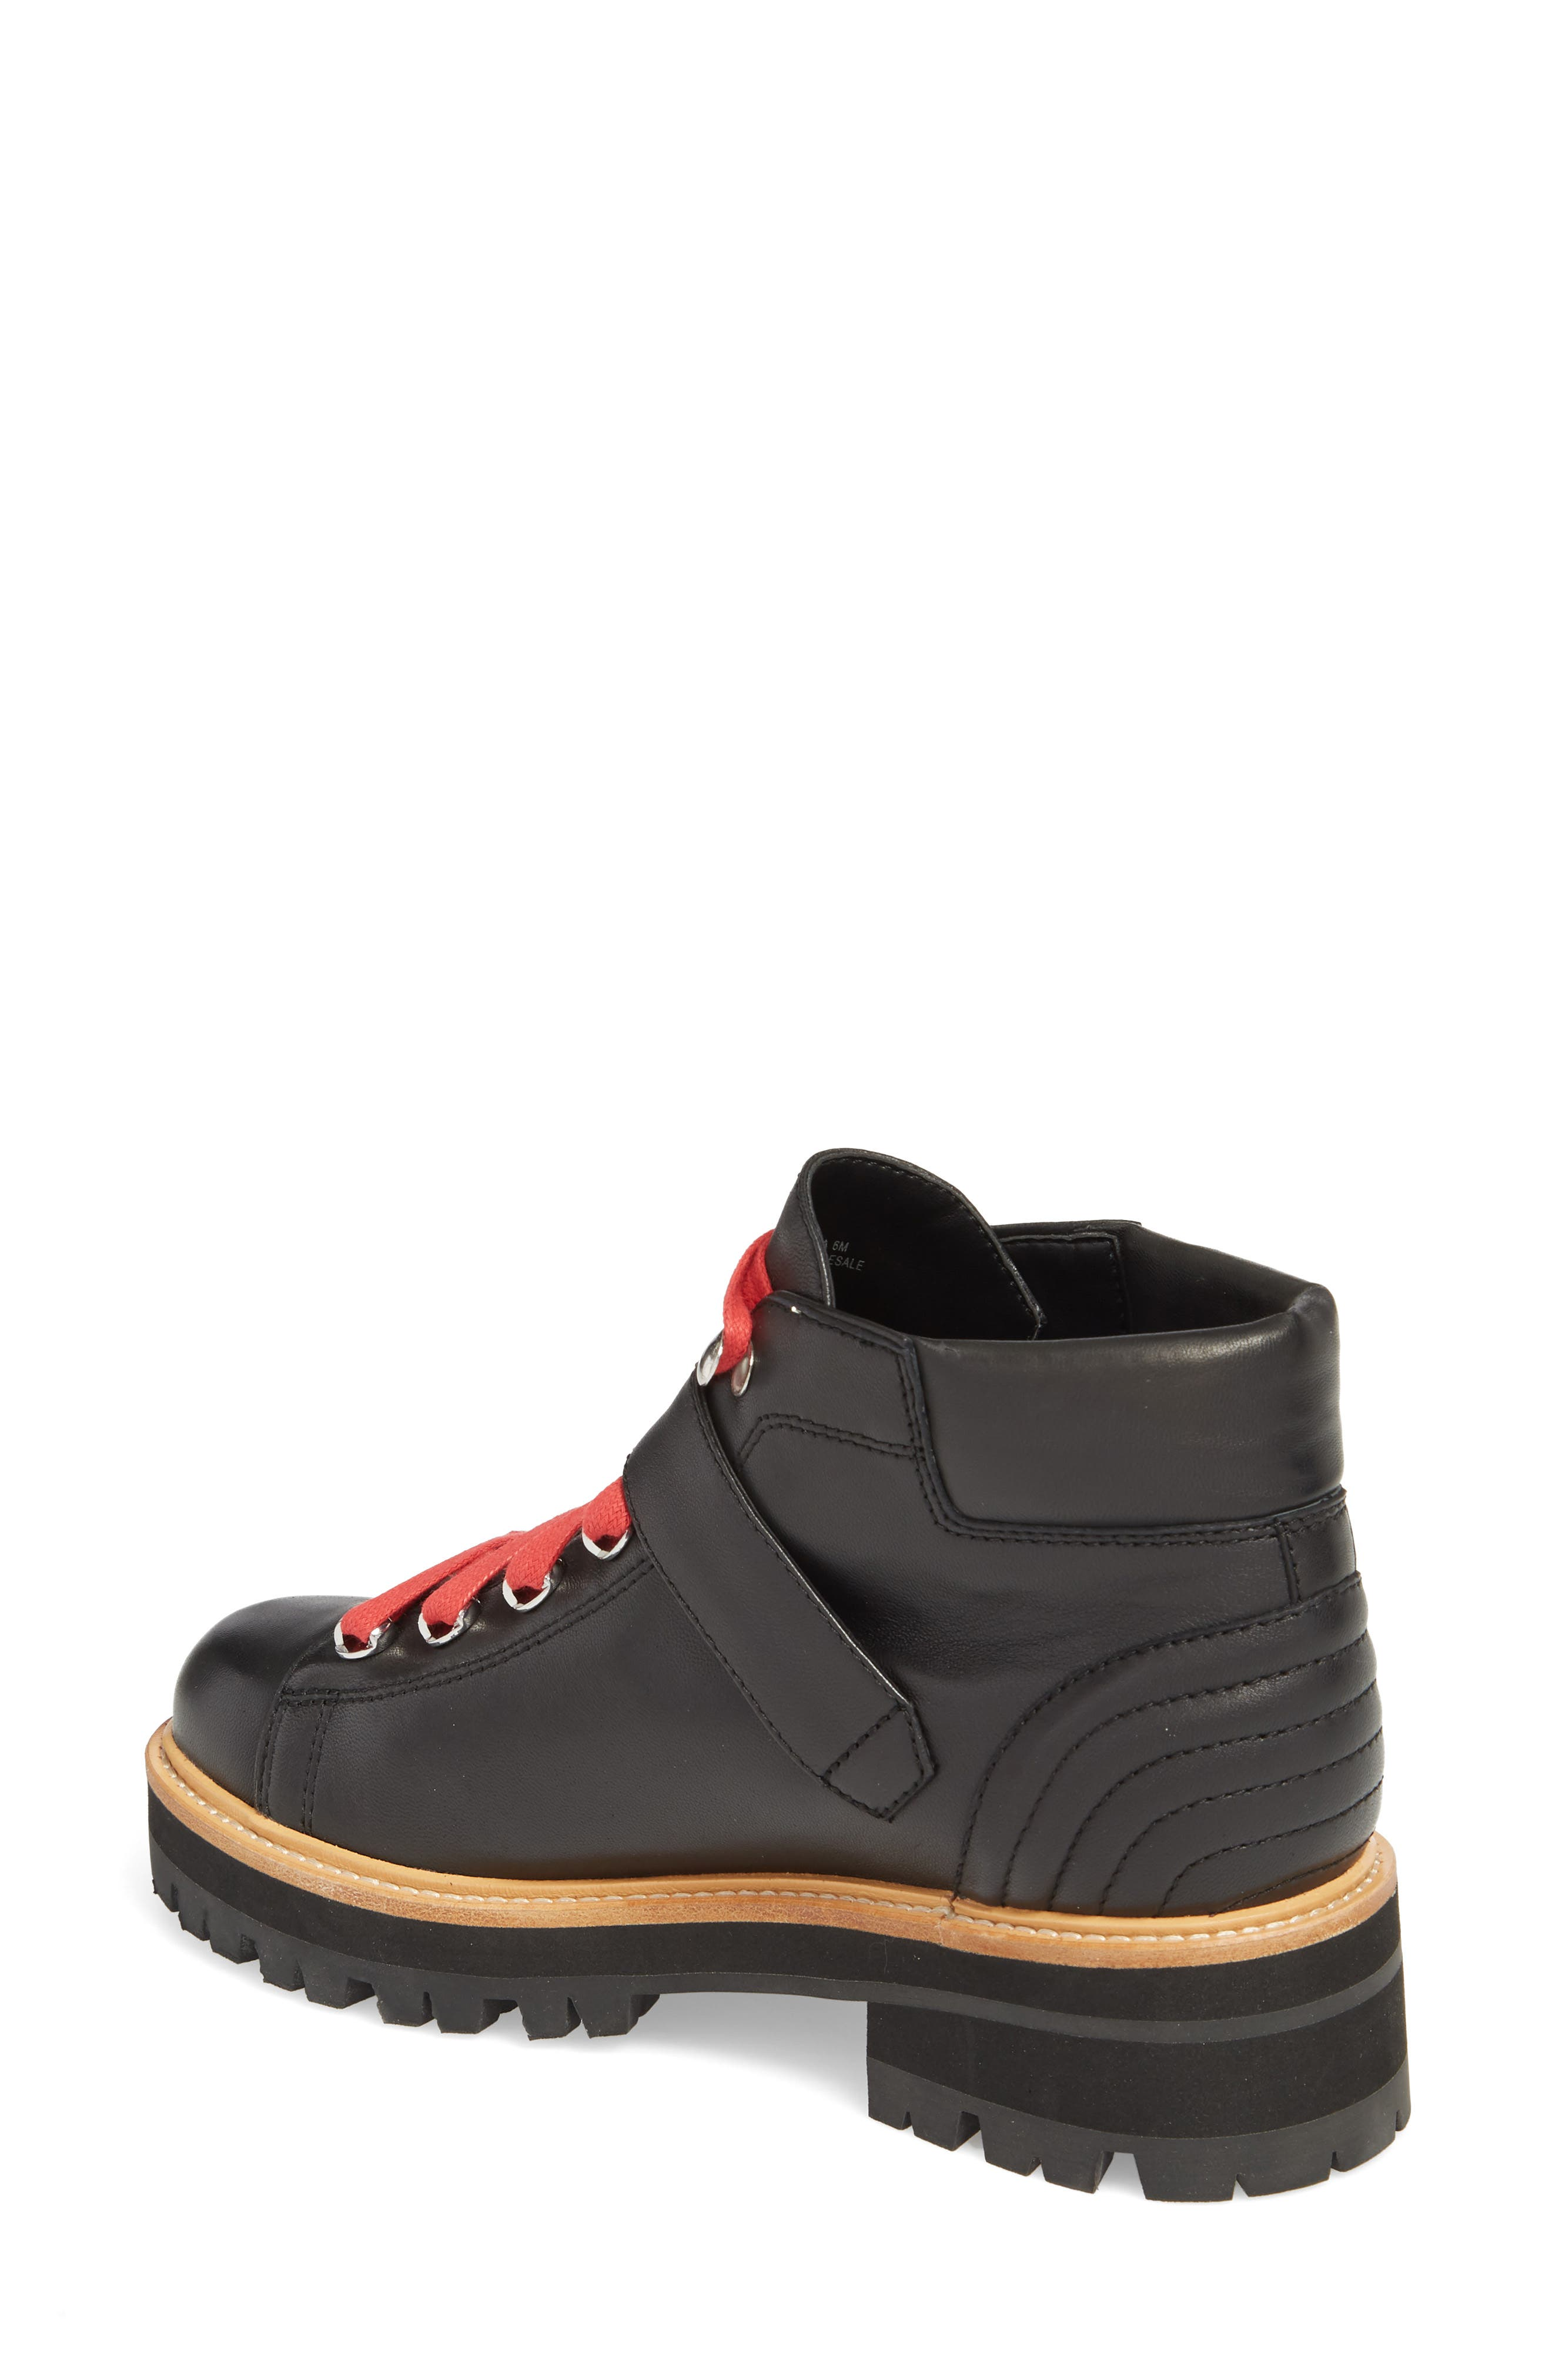 Indre Platform Boot,                             Alternate thumbnail 2, color,                             BLACK LEATHER